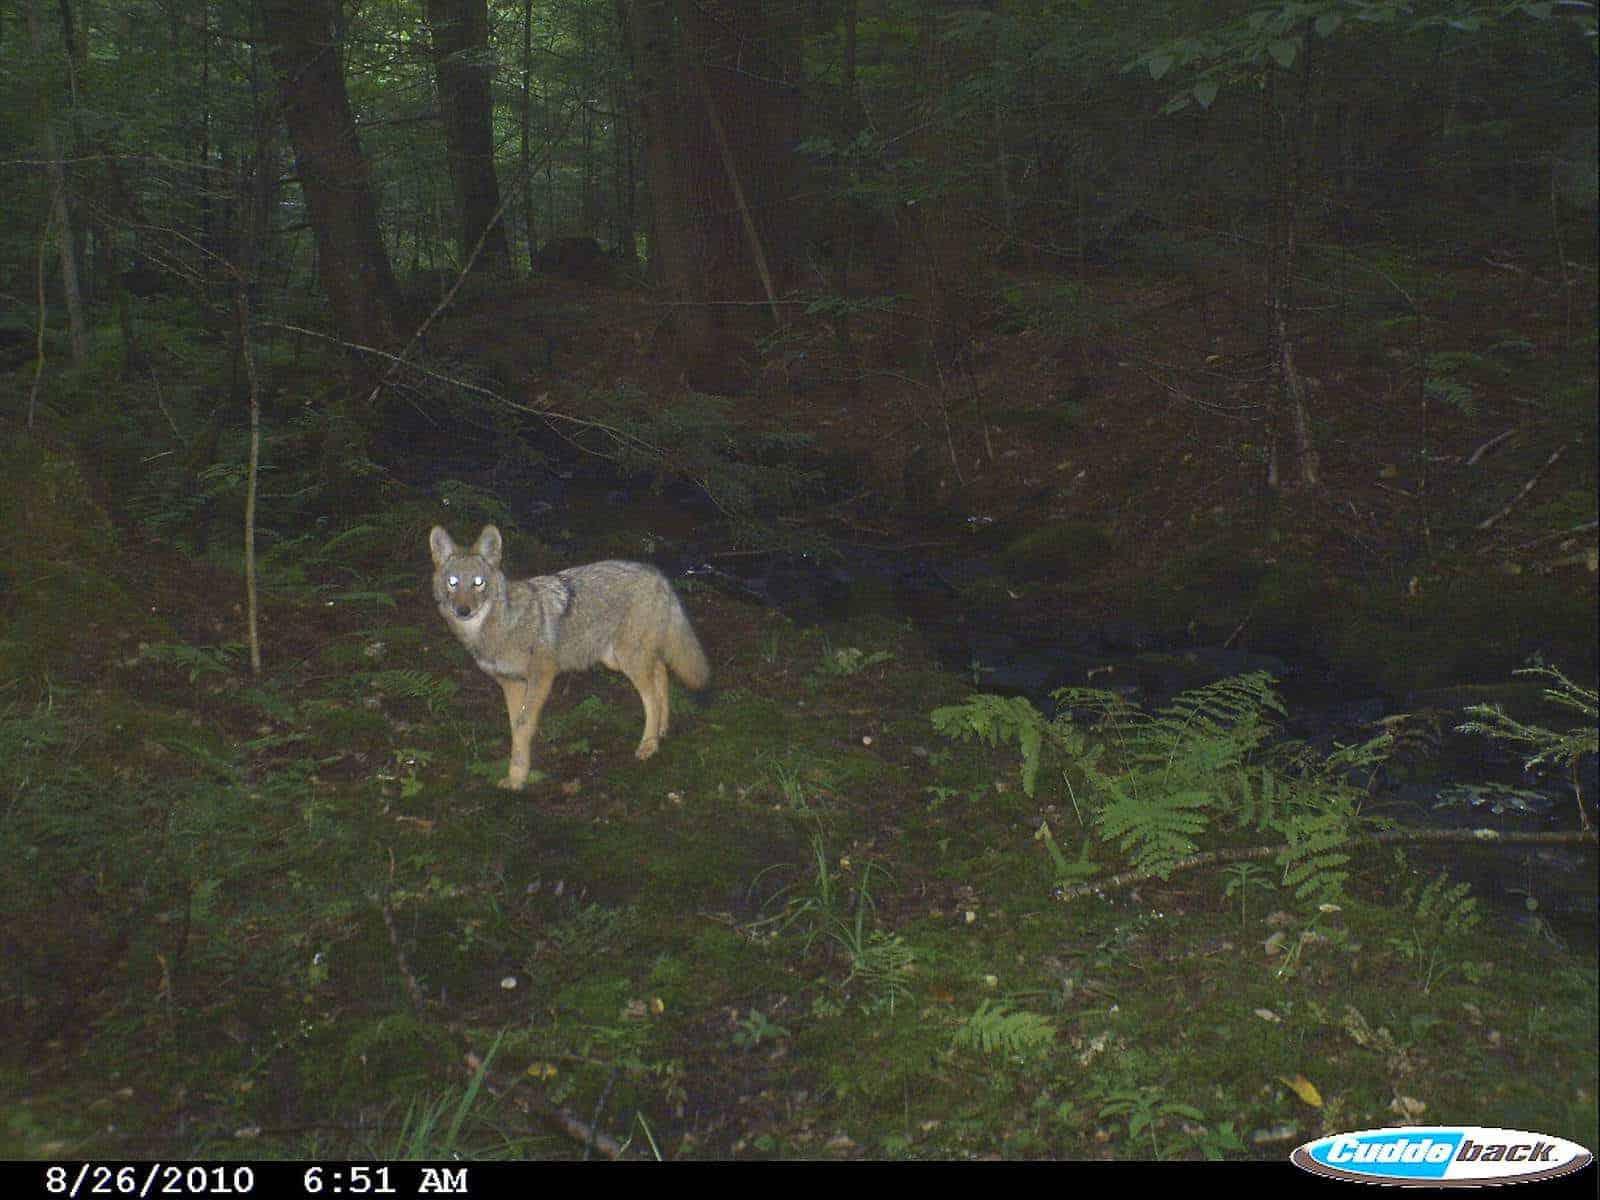 Coyote, New Hampshire